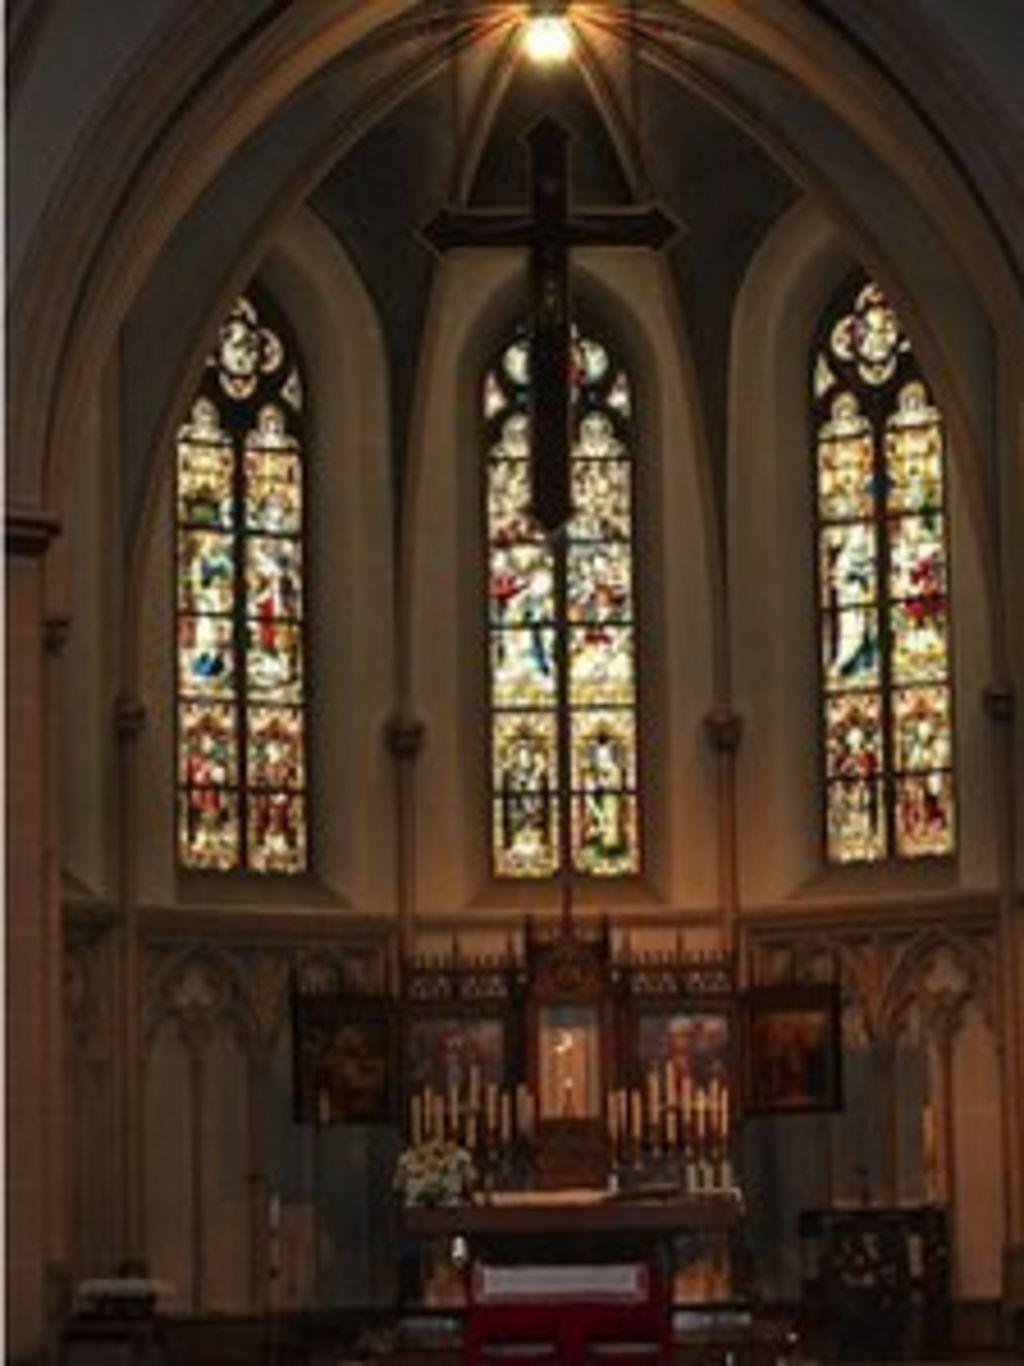 German Catholics lose church rights for unpaid tax - BBC News